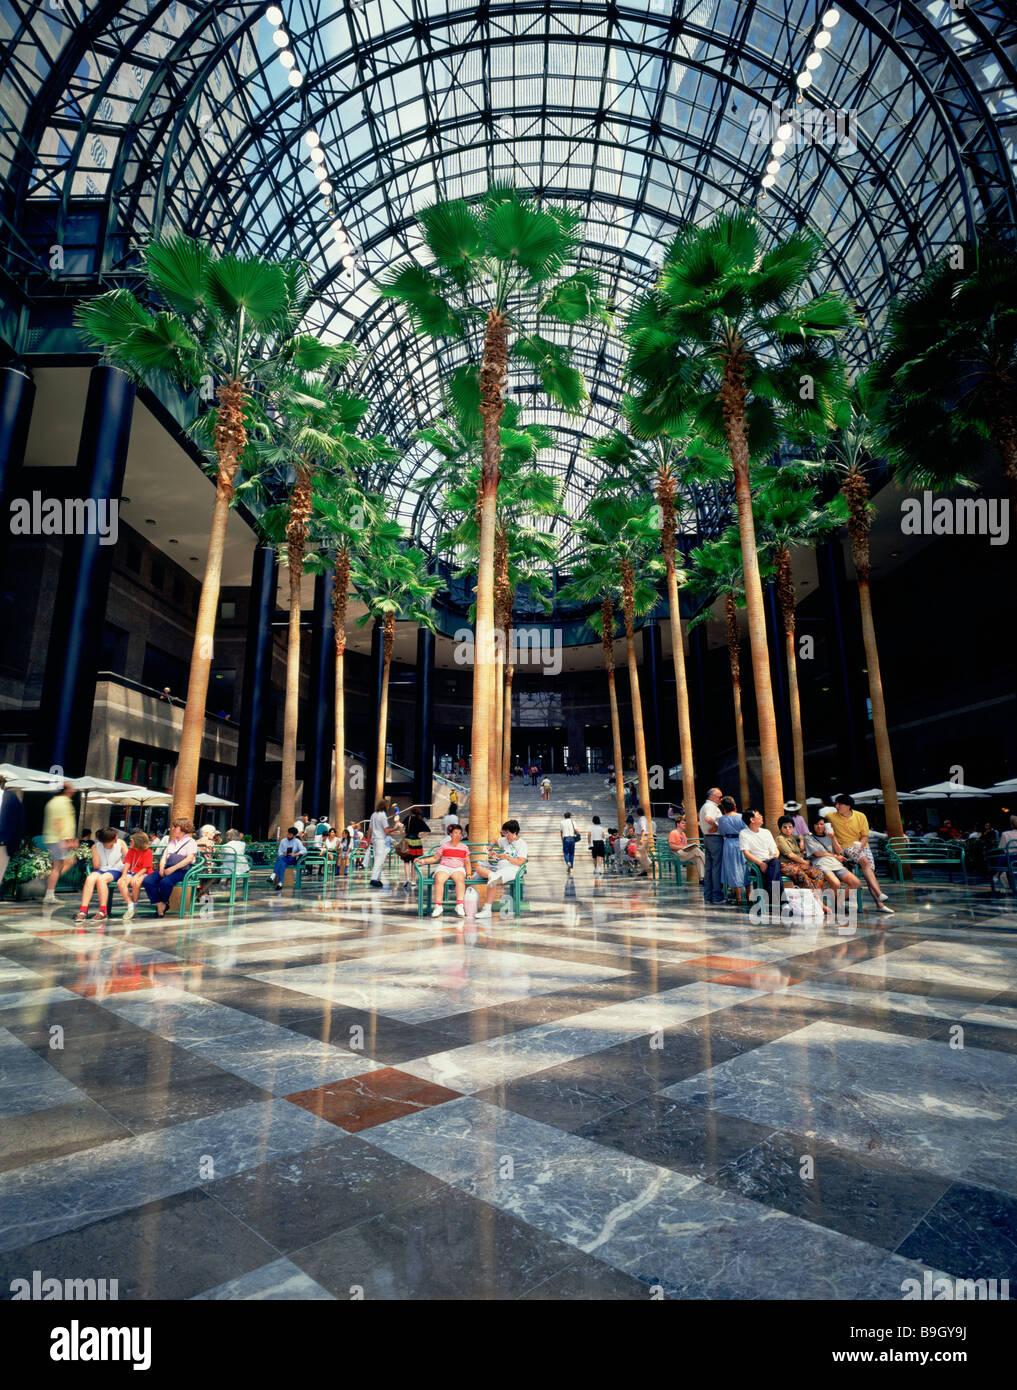 Giardino D Inverno In Vetro stati uniti new york world financial center giardino d